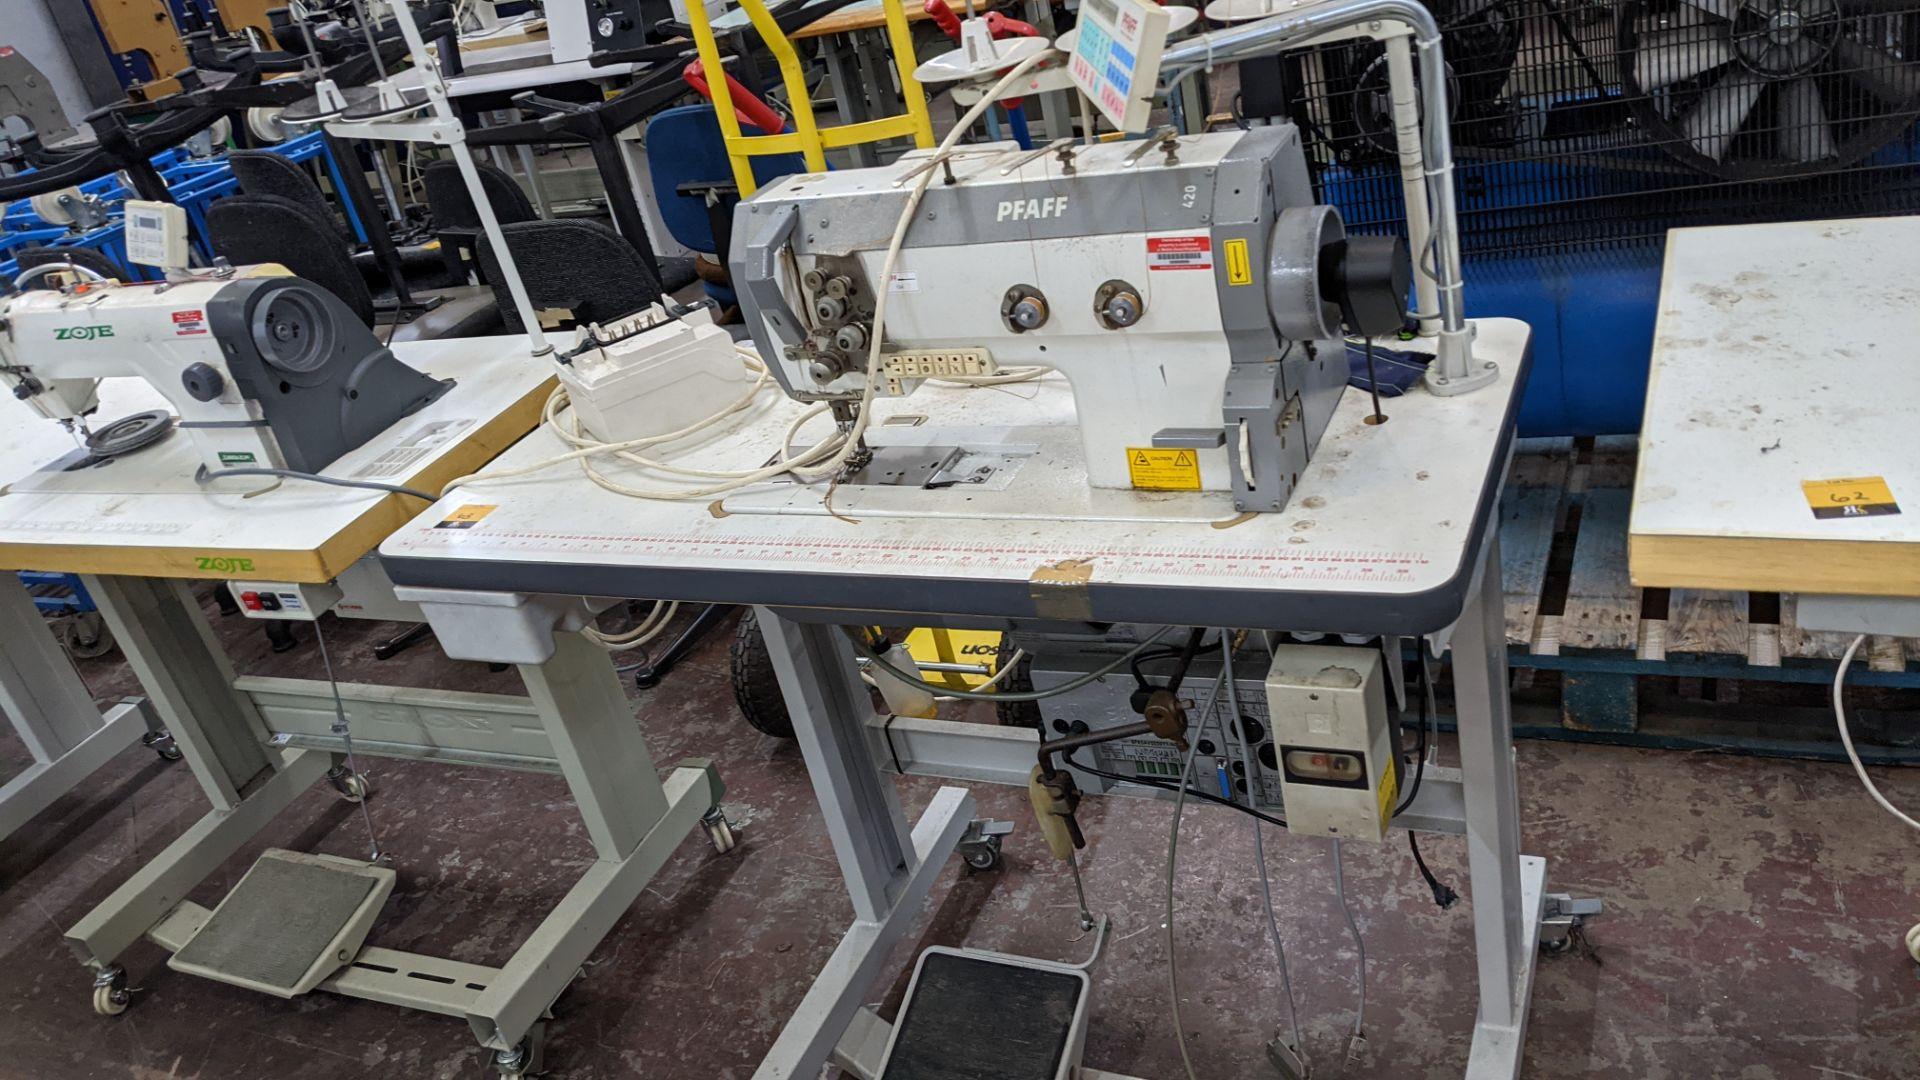 Pfaff twin needle sewing machine, model 422